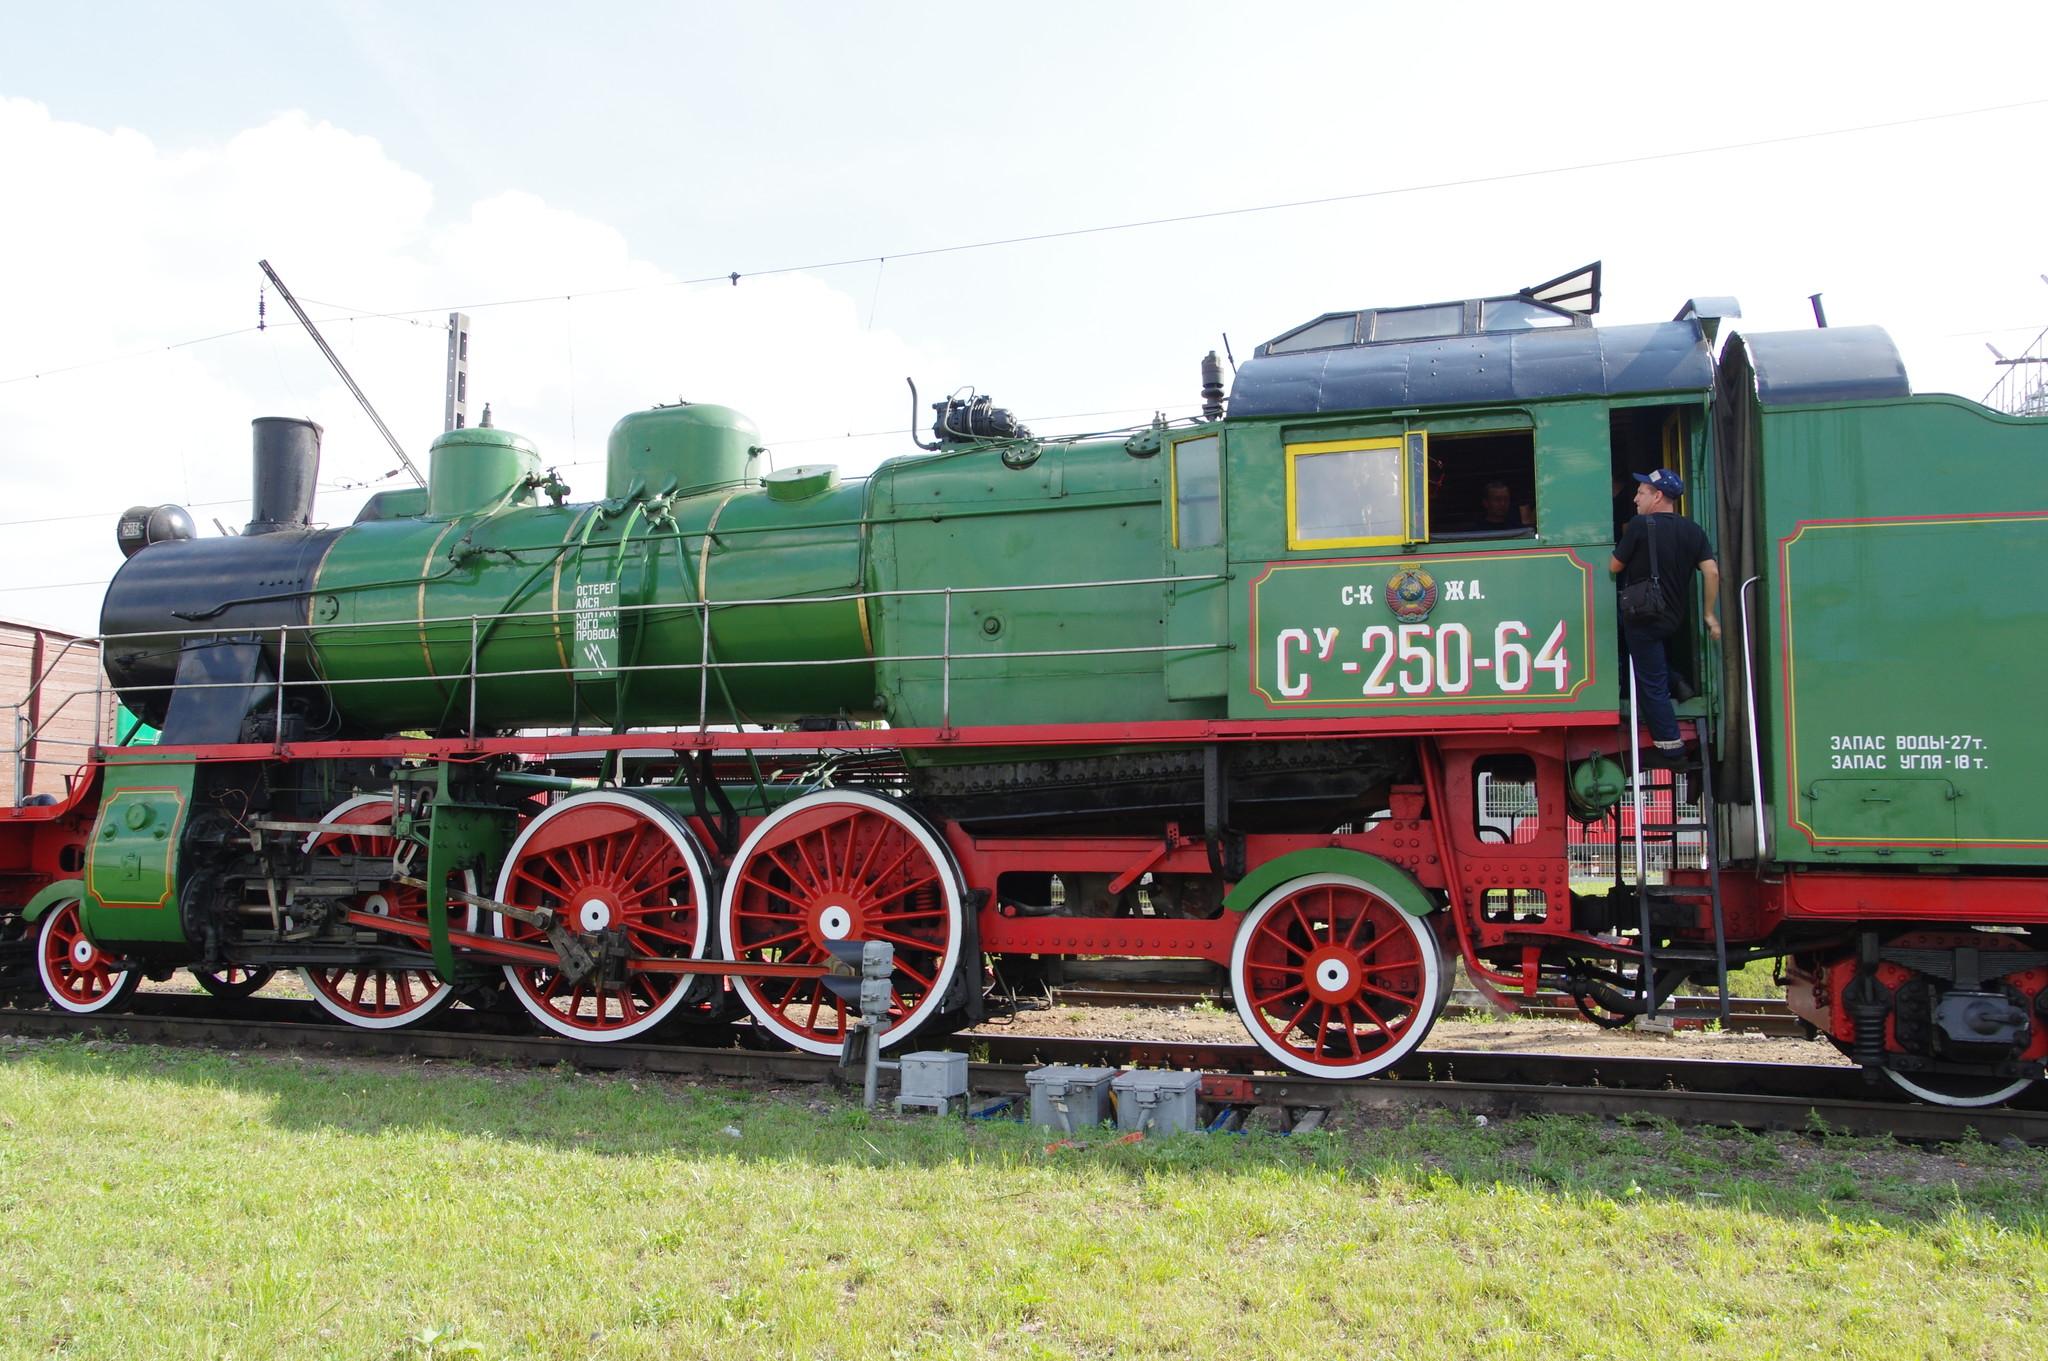 Пассажирский паровоз Су-250-64